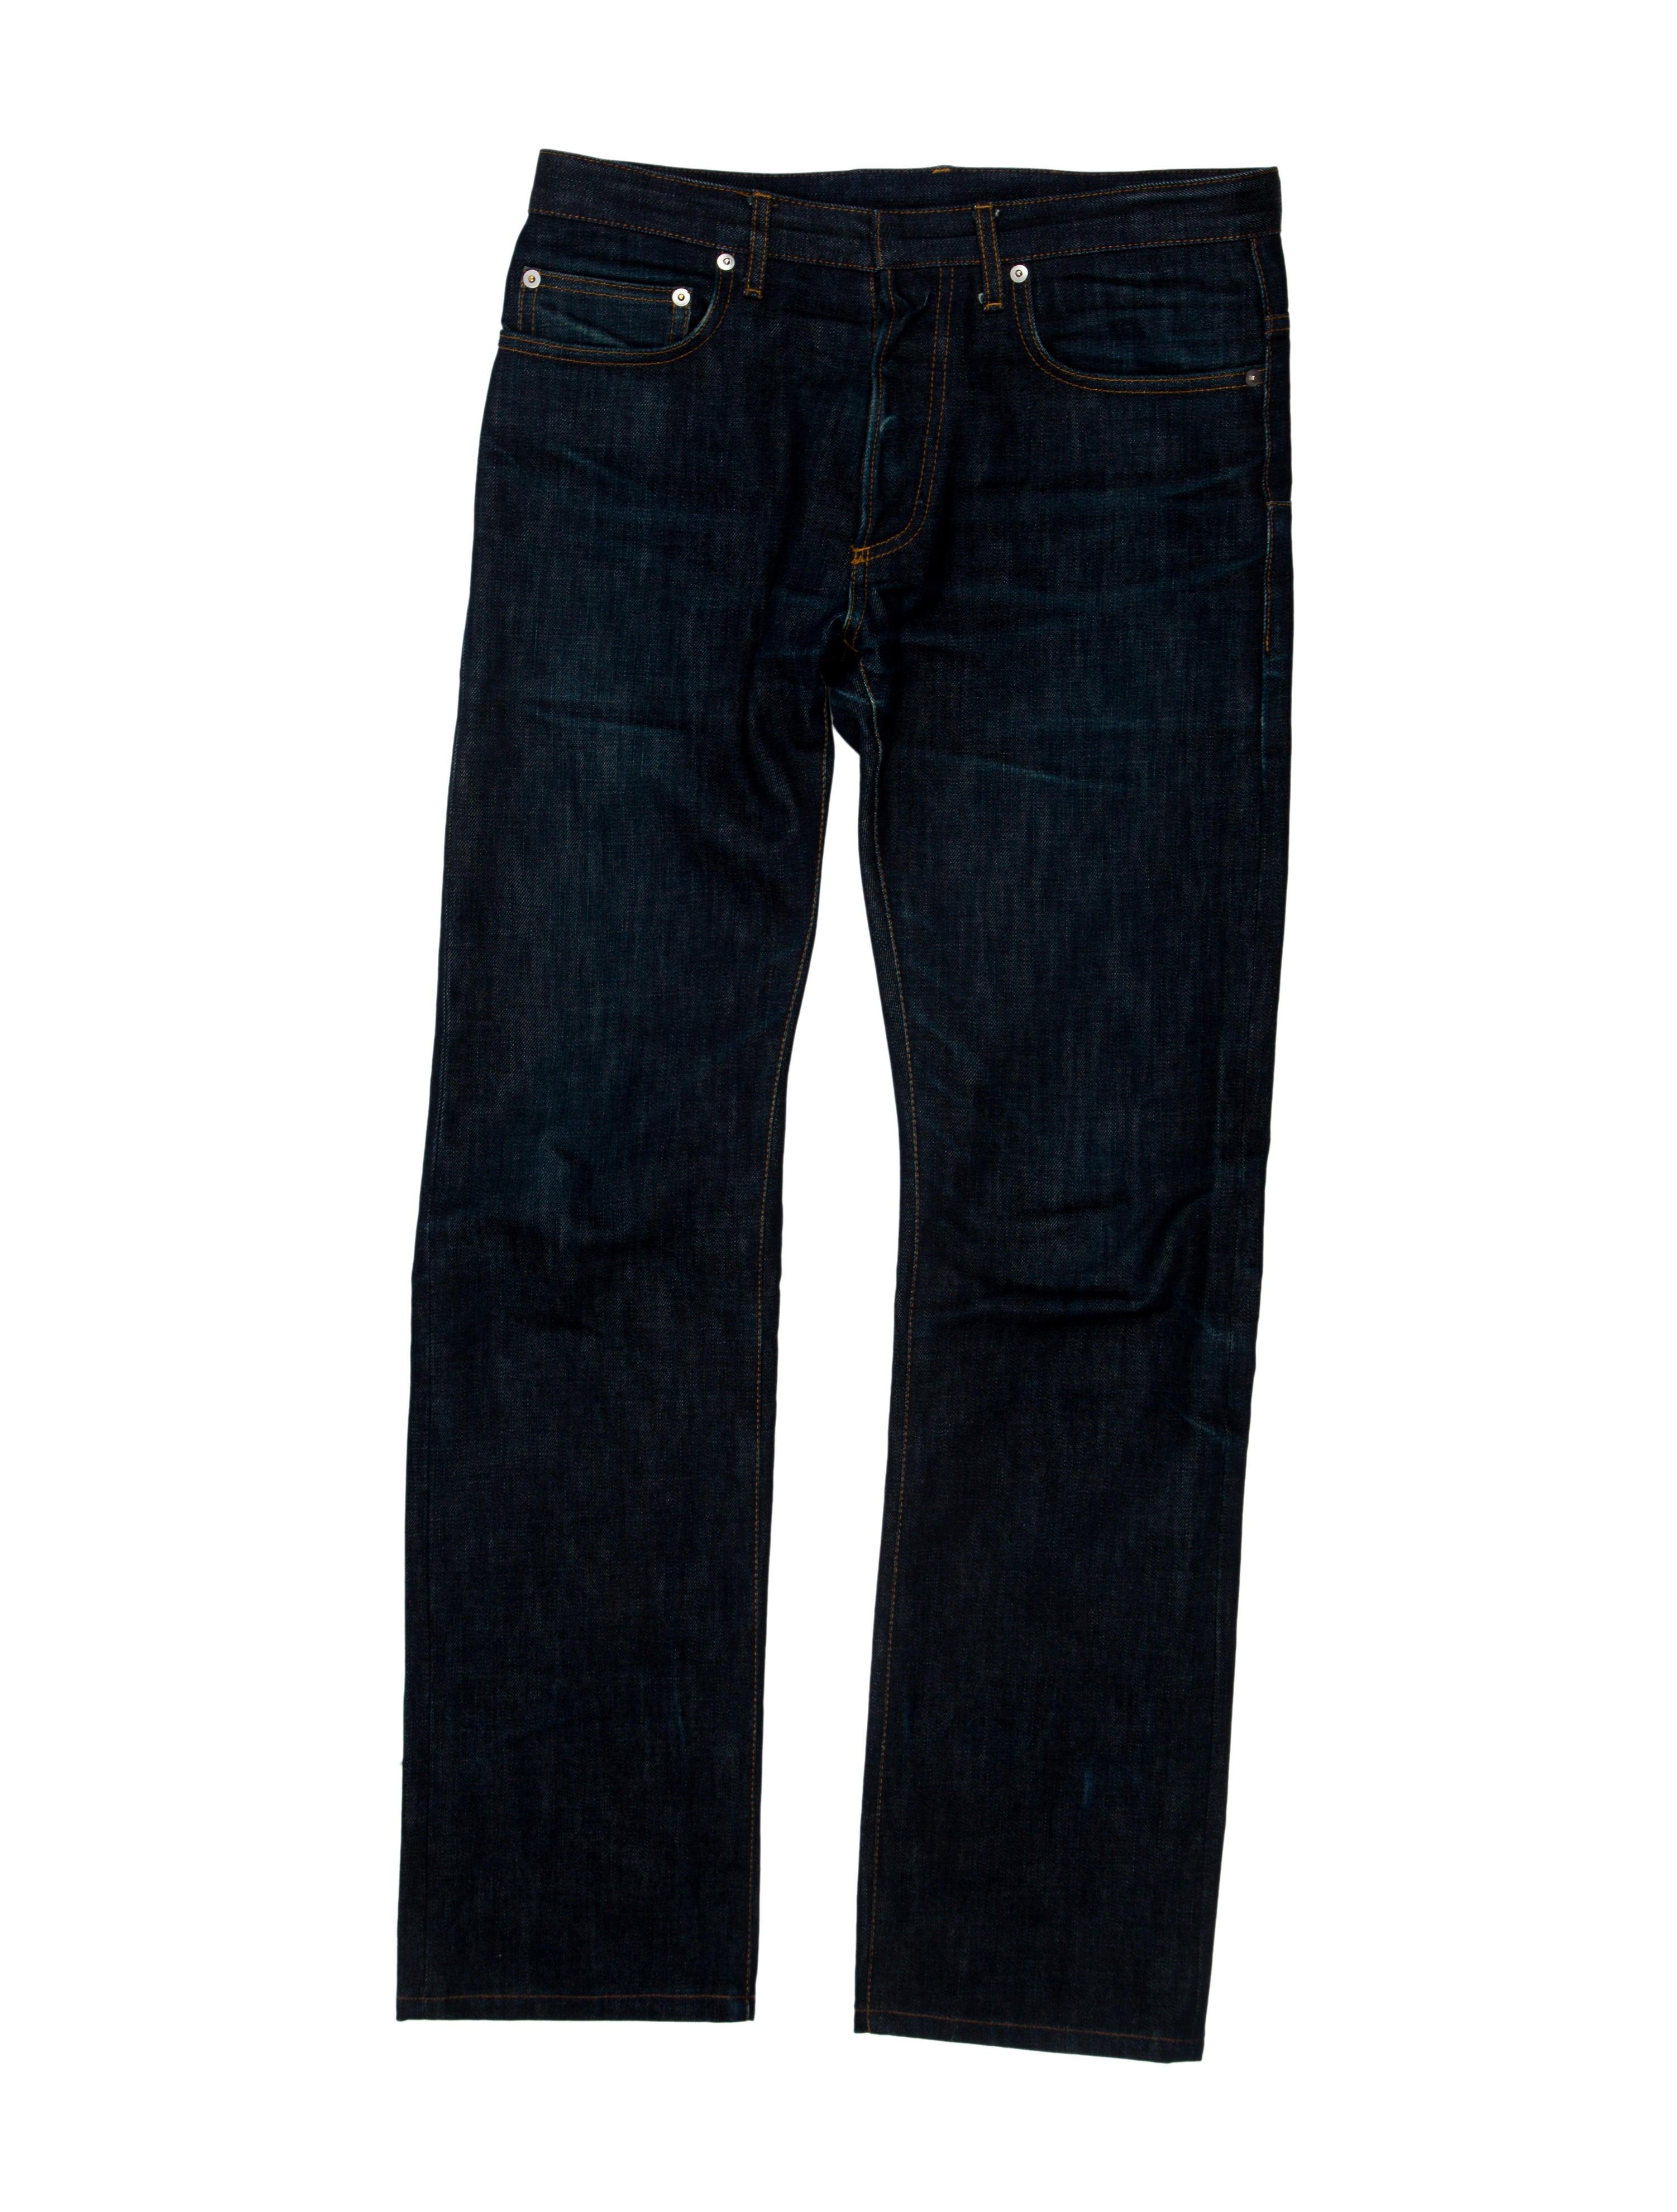 dior homme jeans clothing hmm21040 the realreal. Black Bedroom Furniture Sets. Home Design Ideas